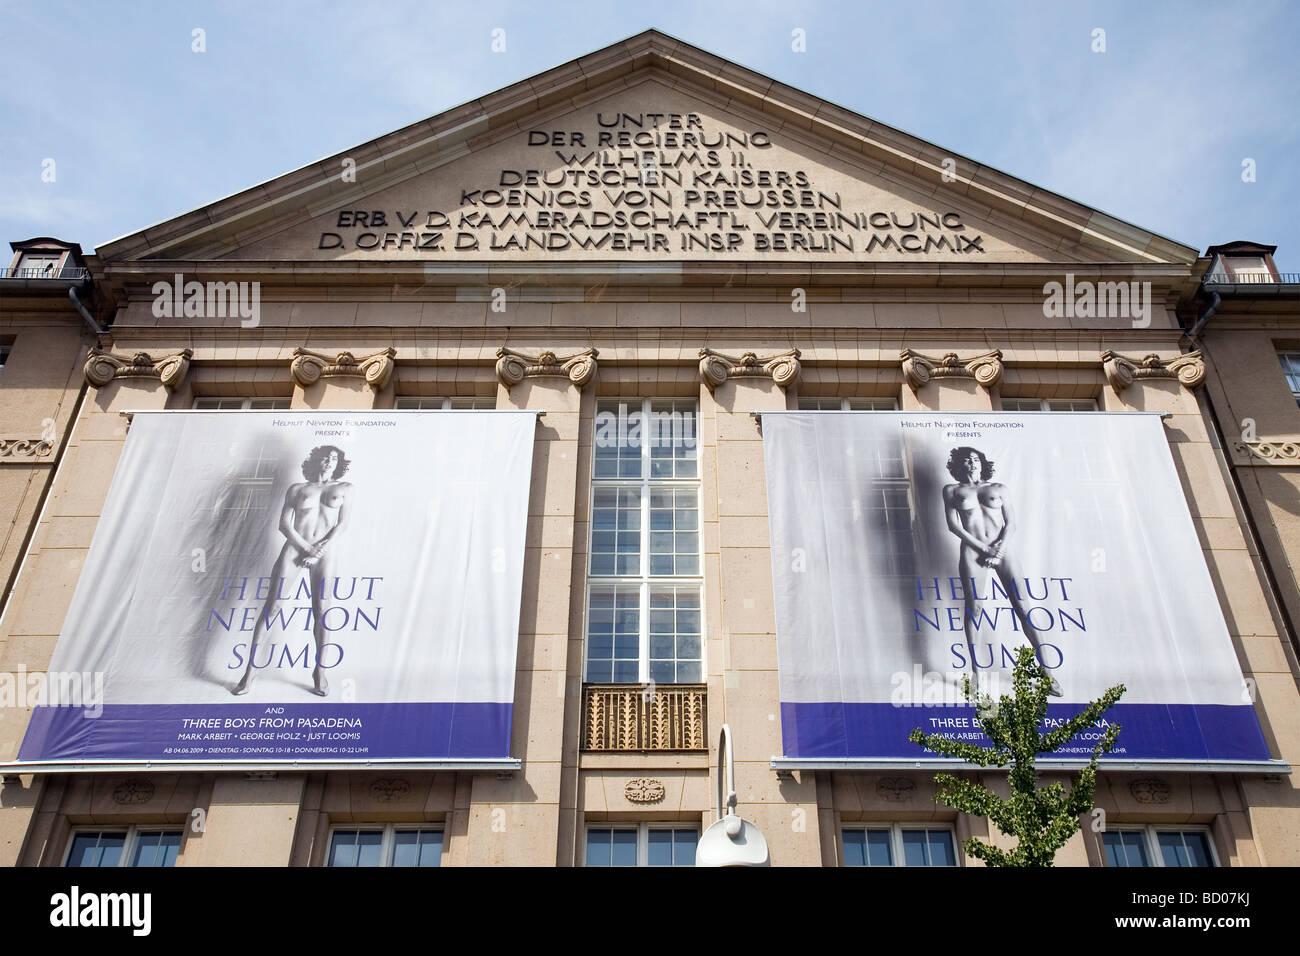 Helmut Newton Stiftung - Museo de Fotografía, Berlín, Alemania Imagen De Stock